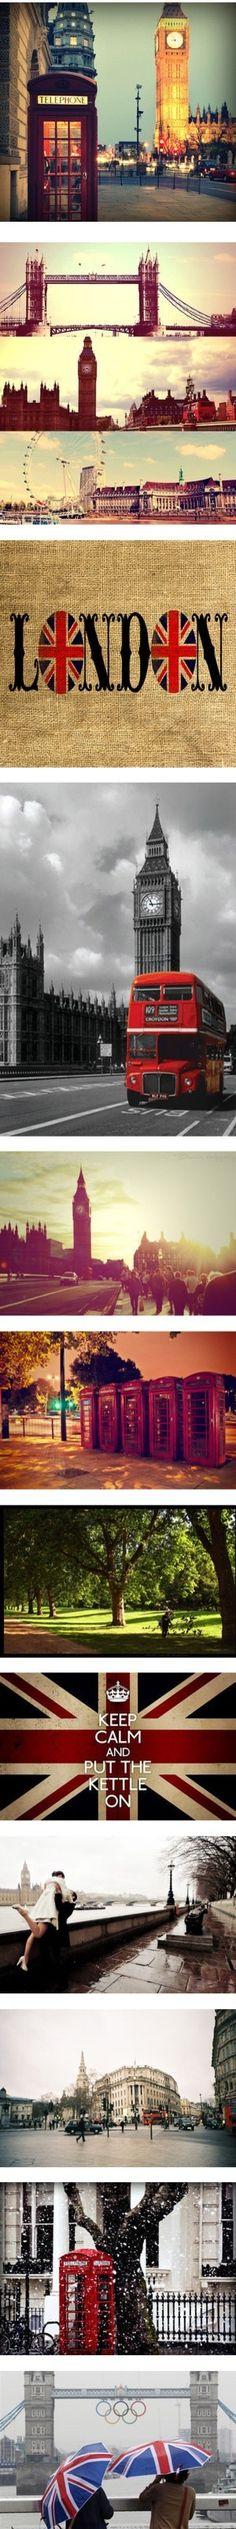 Londen!!!!!!!!!!!!!!!!!!!!!!!!!!!!!!!!!!!!!!